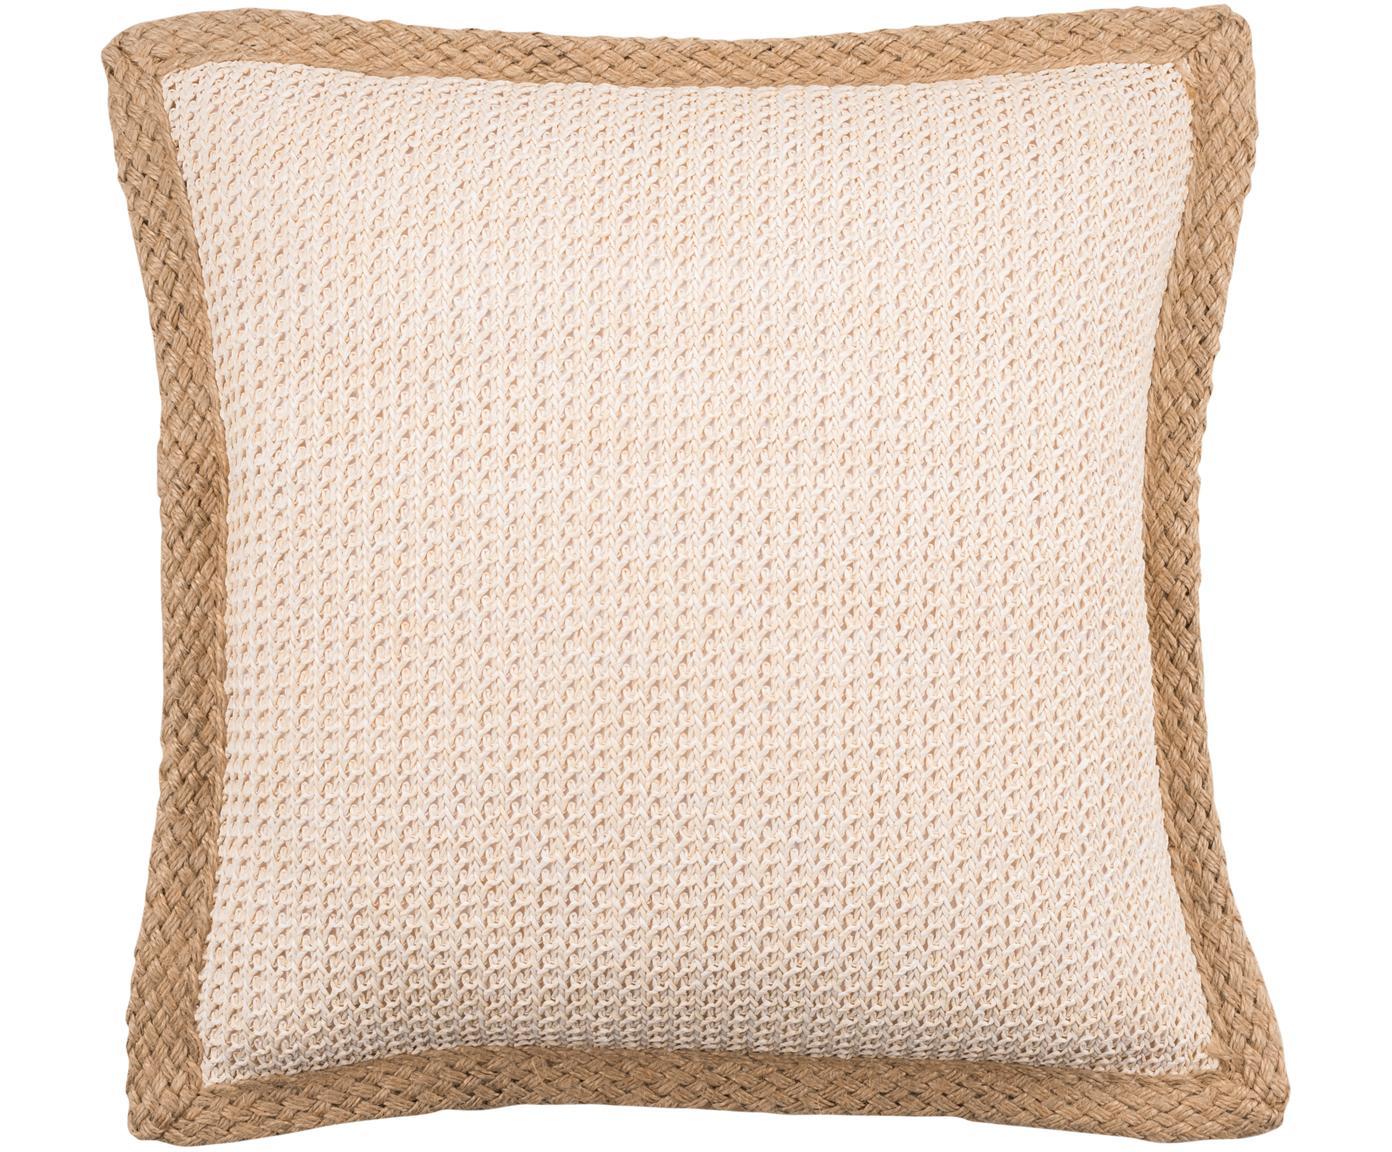 Kissenhülle Tally mit Jute-Keder, 50% Jute, 50% Baumwolle, Weiß, Beige, 45 x 45 cm